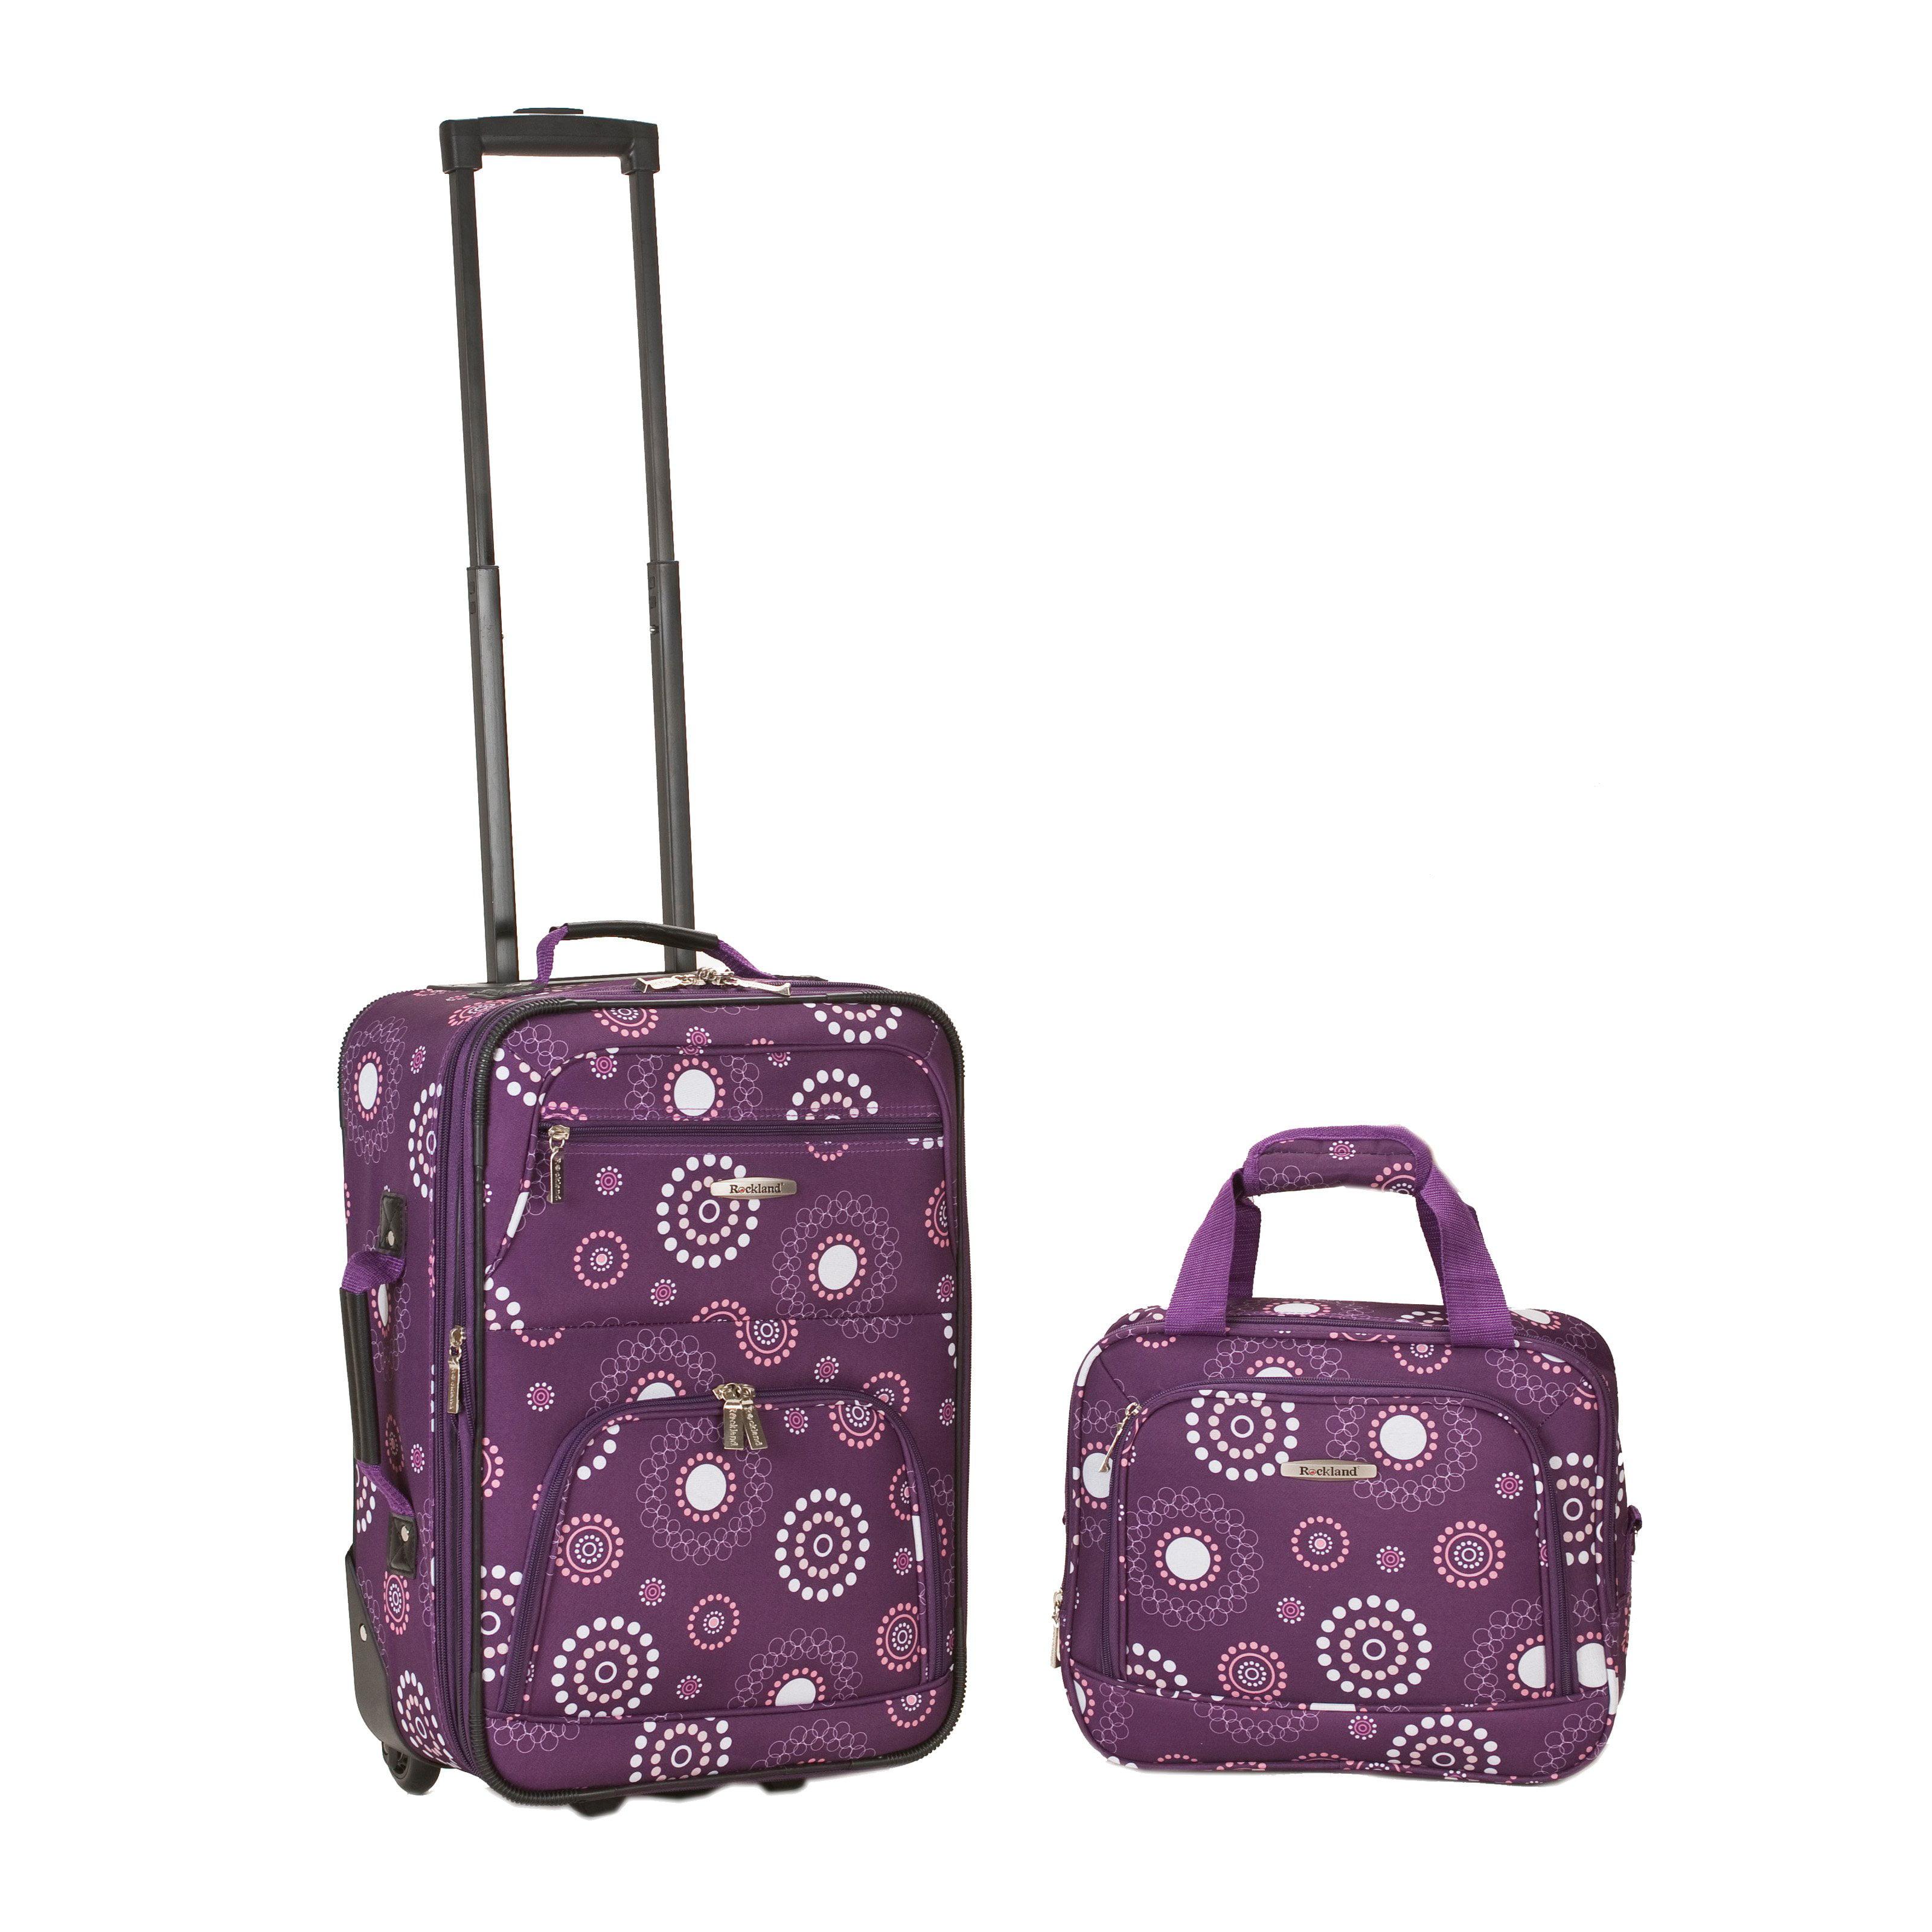 Rockland Luggage 2 Piece Expandable Rolling Luggage Set